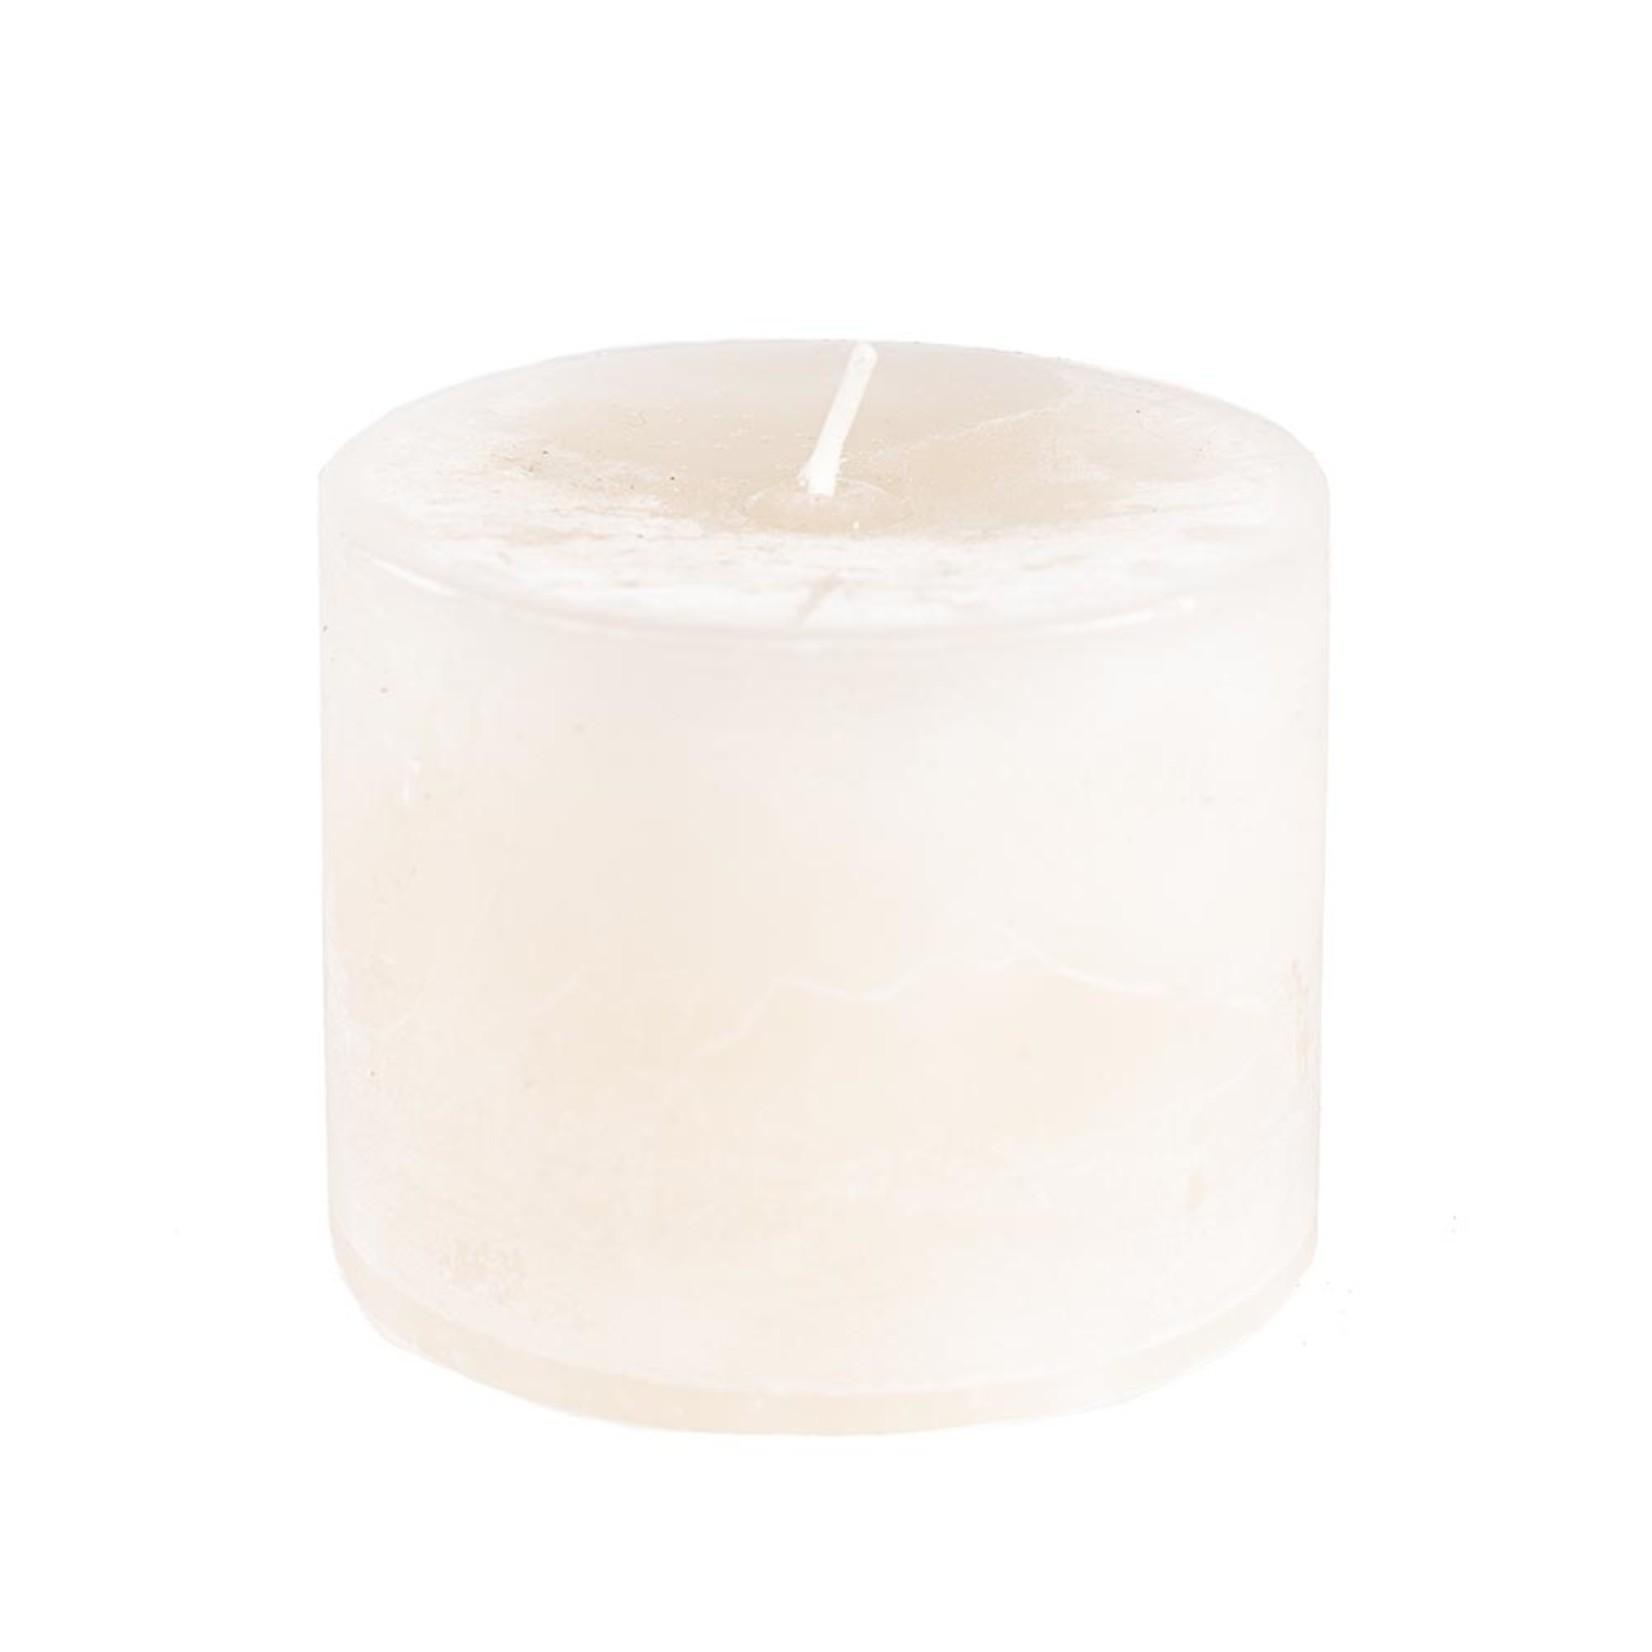 Home Society Pillar Candle 9x7cm Creme